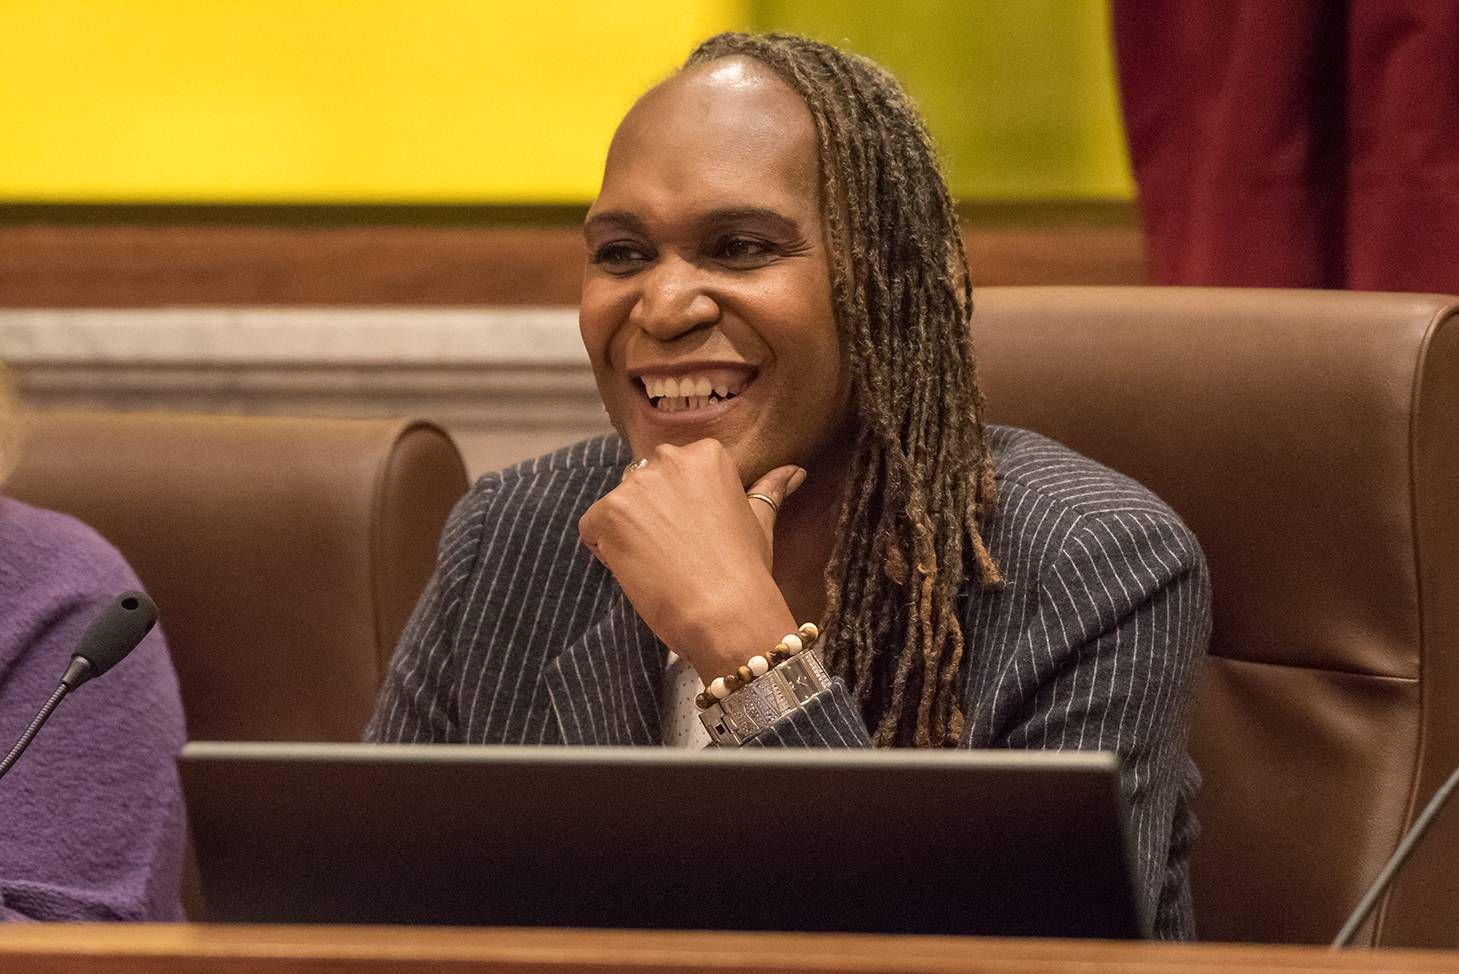 Photo of Andrea Jenkins, smiling. pride, taking back pride